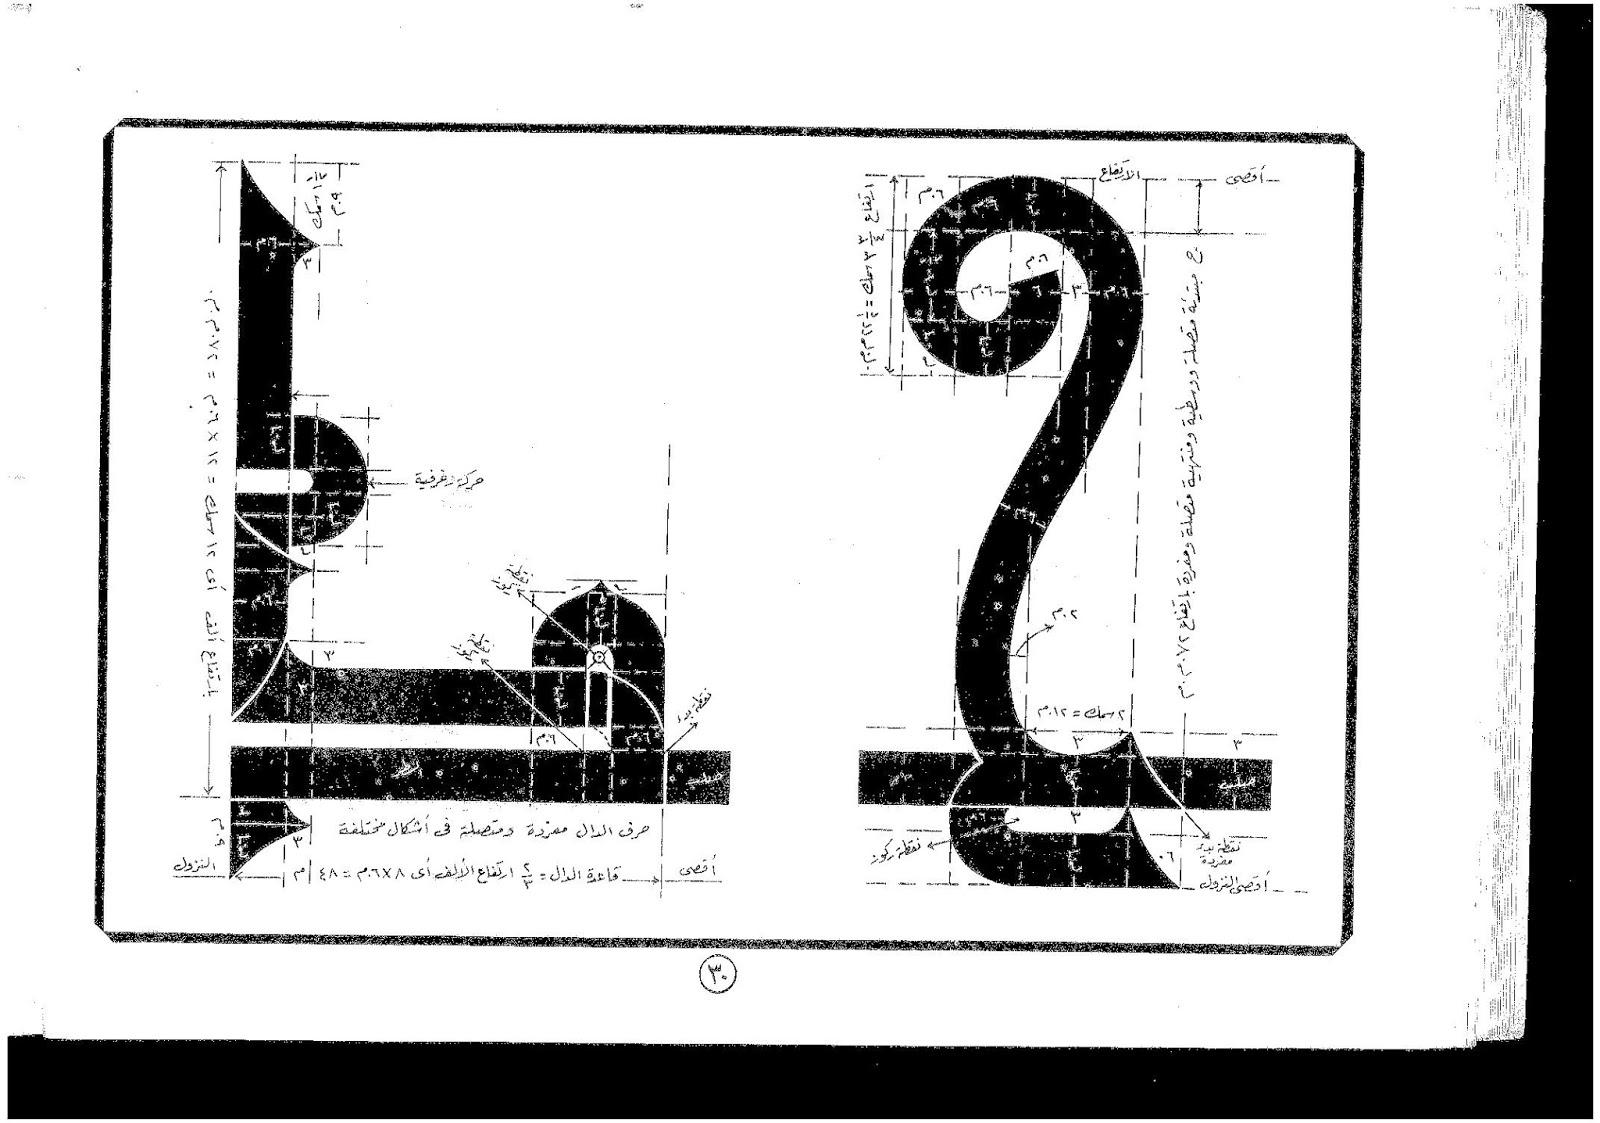 PUSTAKA KALIGRAFI: AHDATS AL-THURUQ LI DIRASAH WA TAHSIN ...